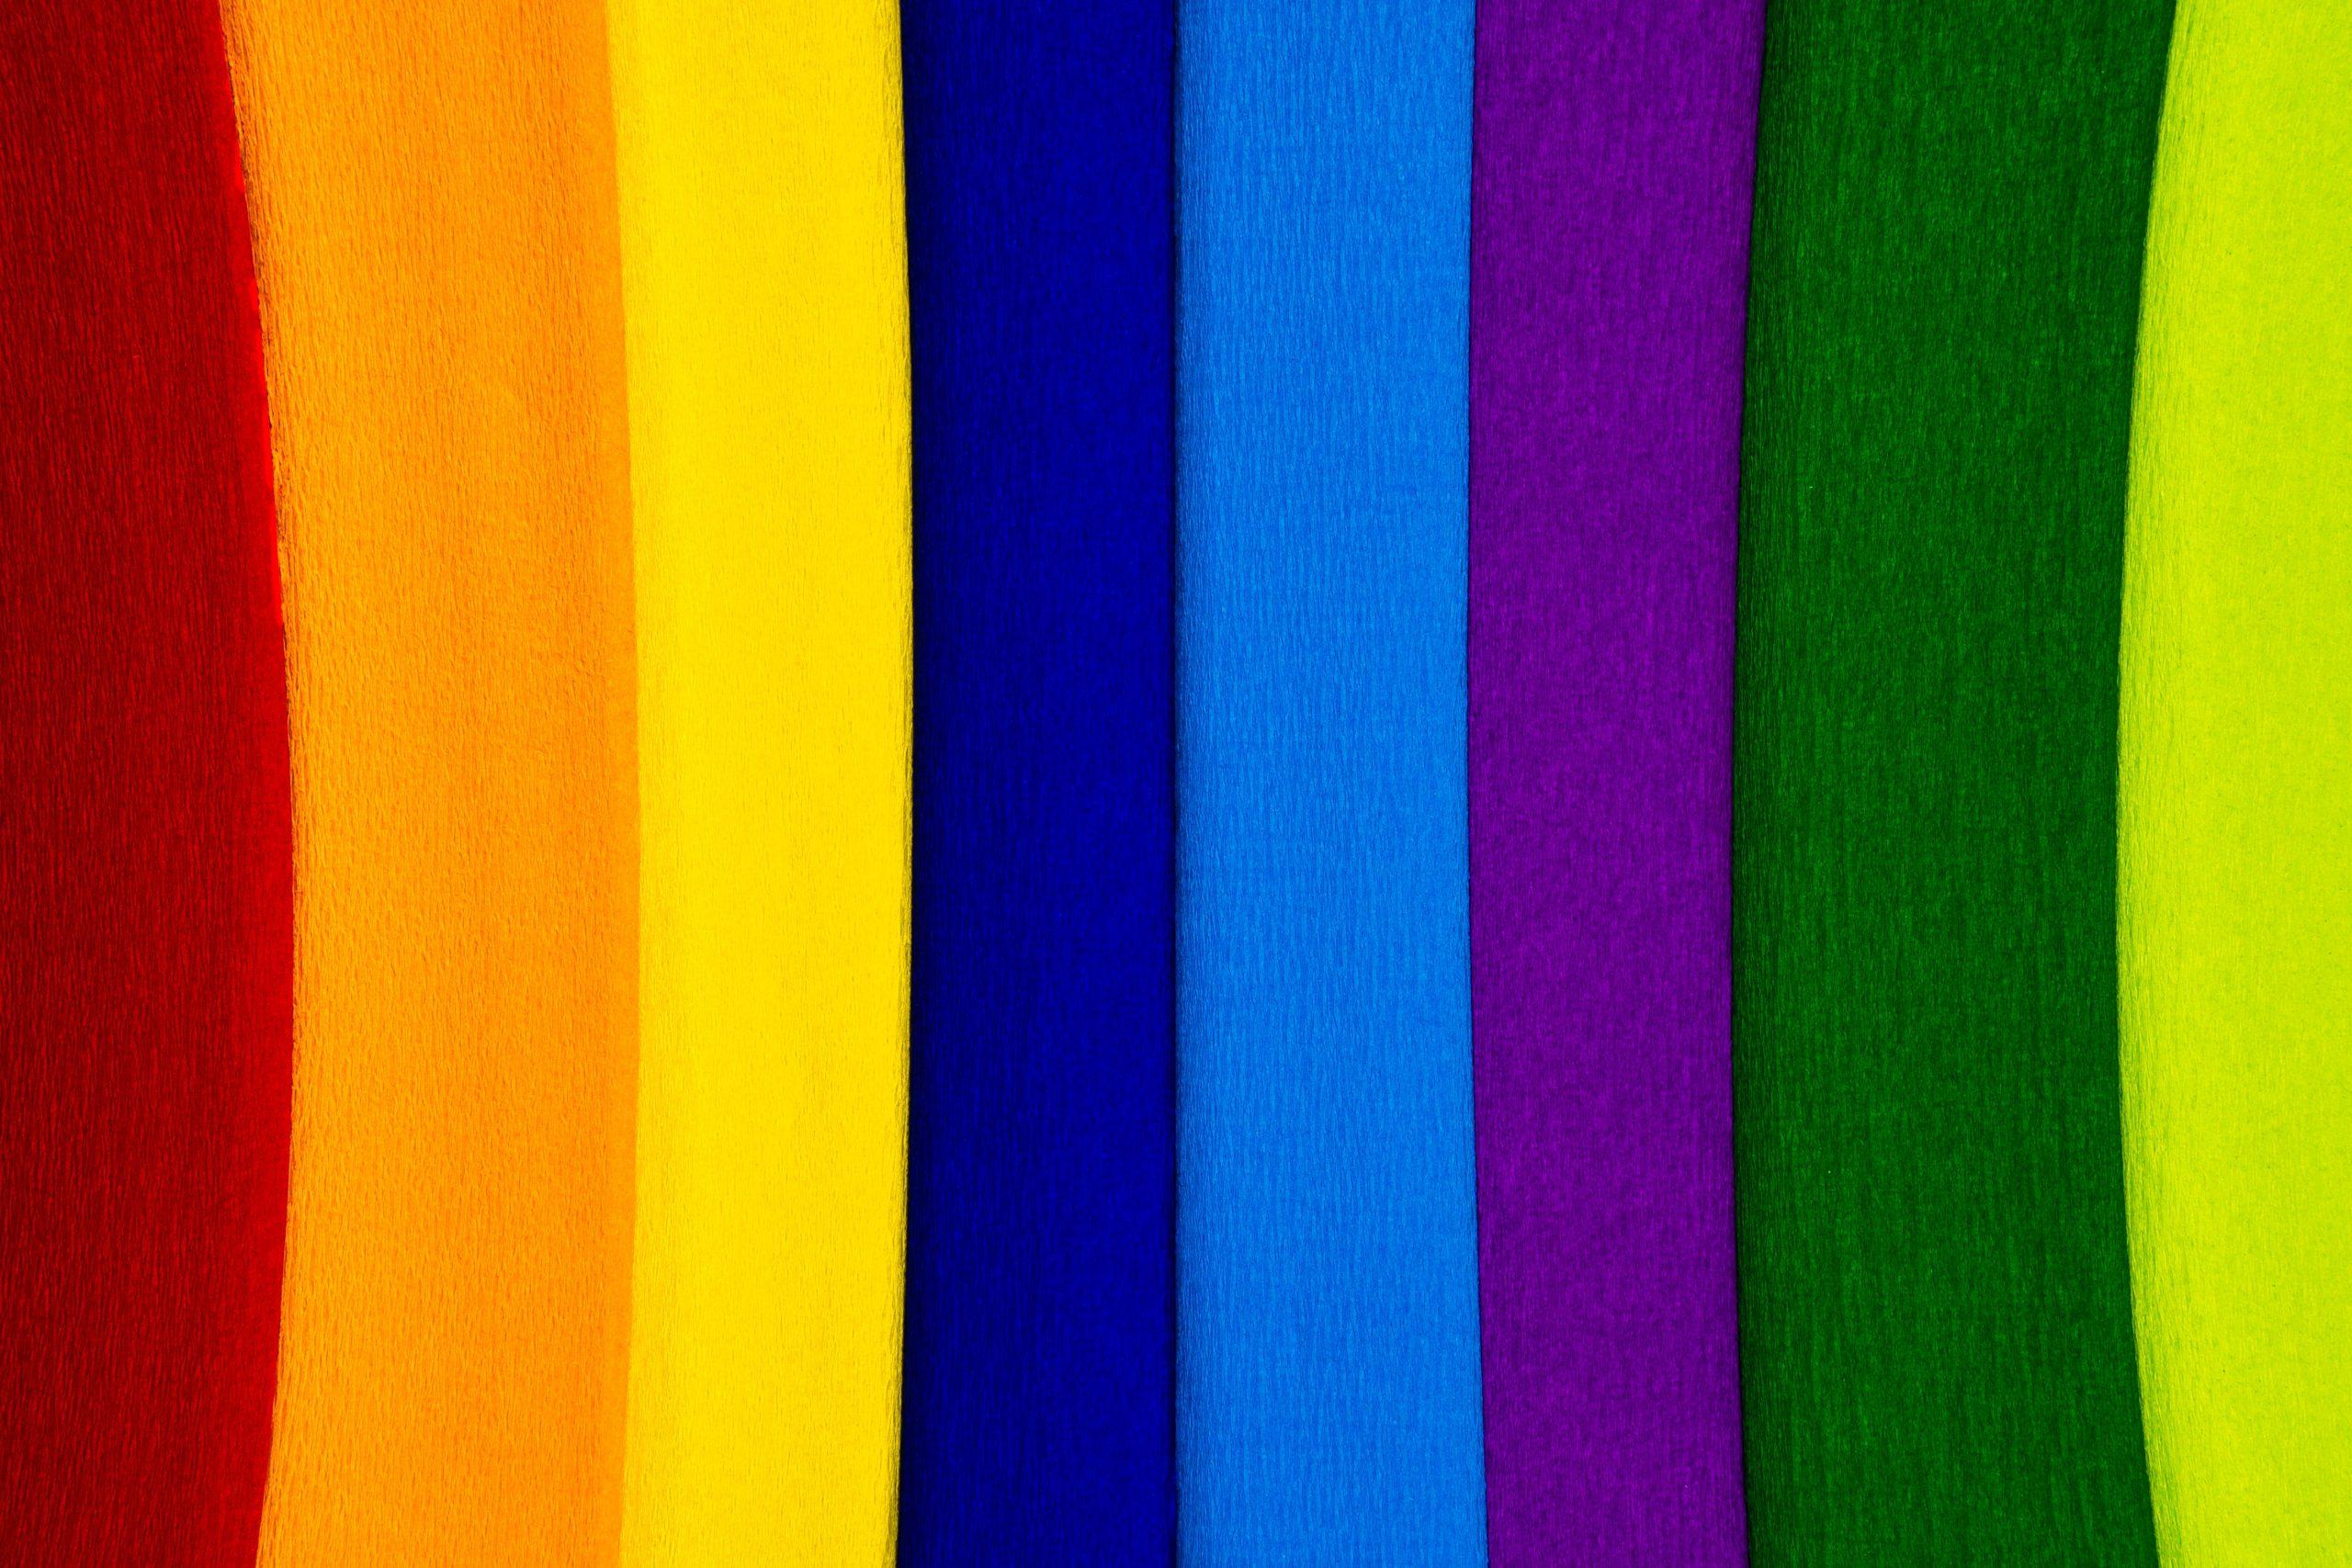 colorful flag